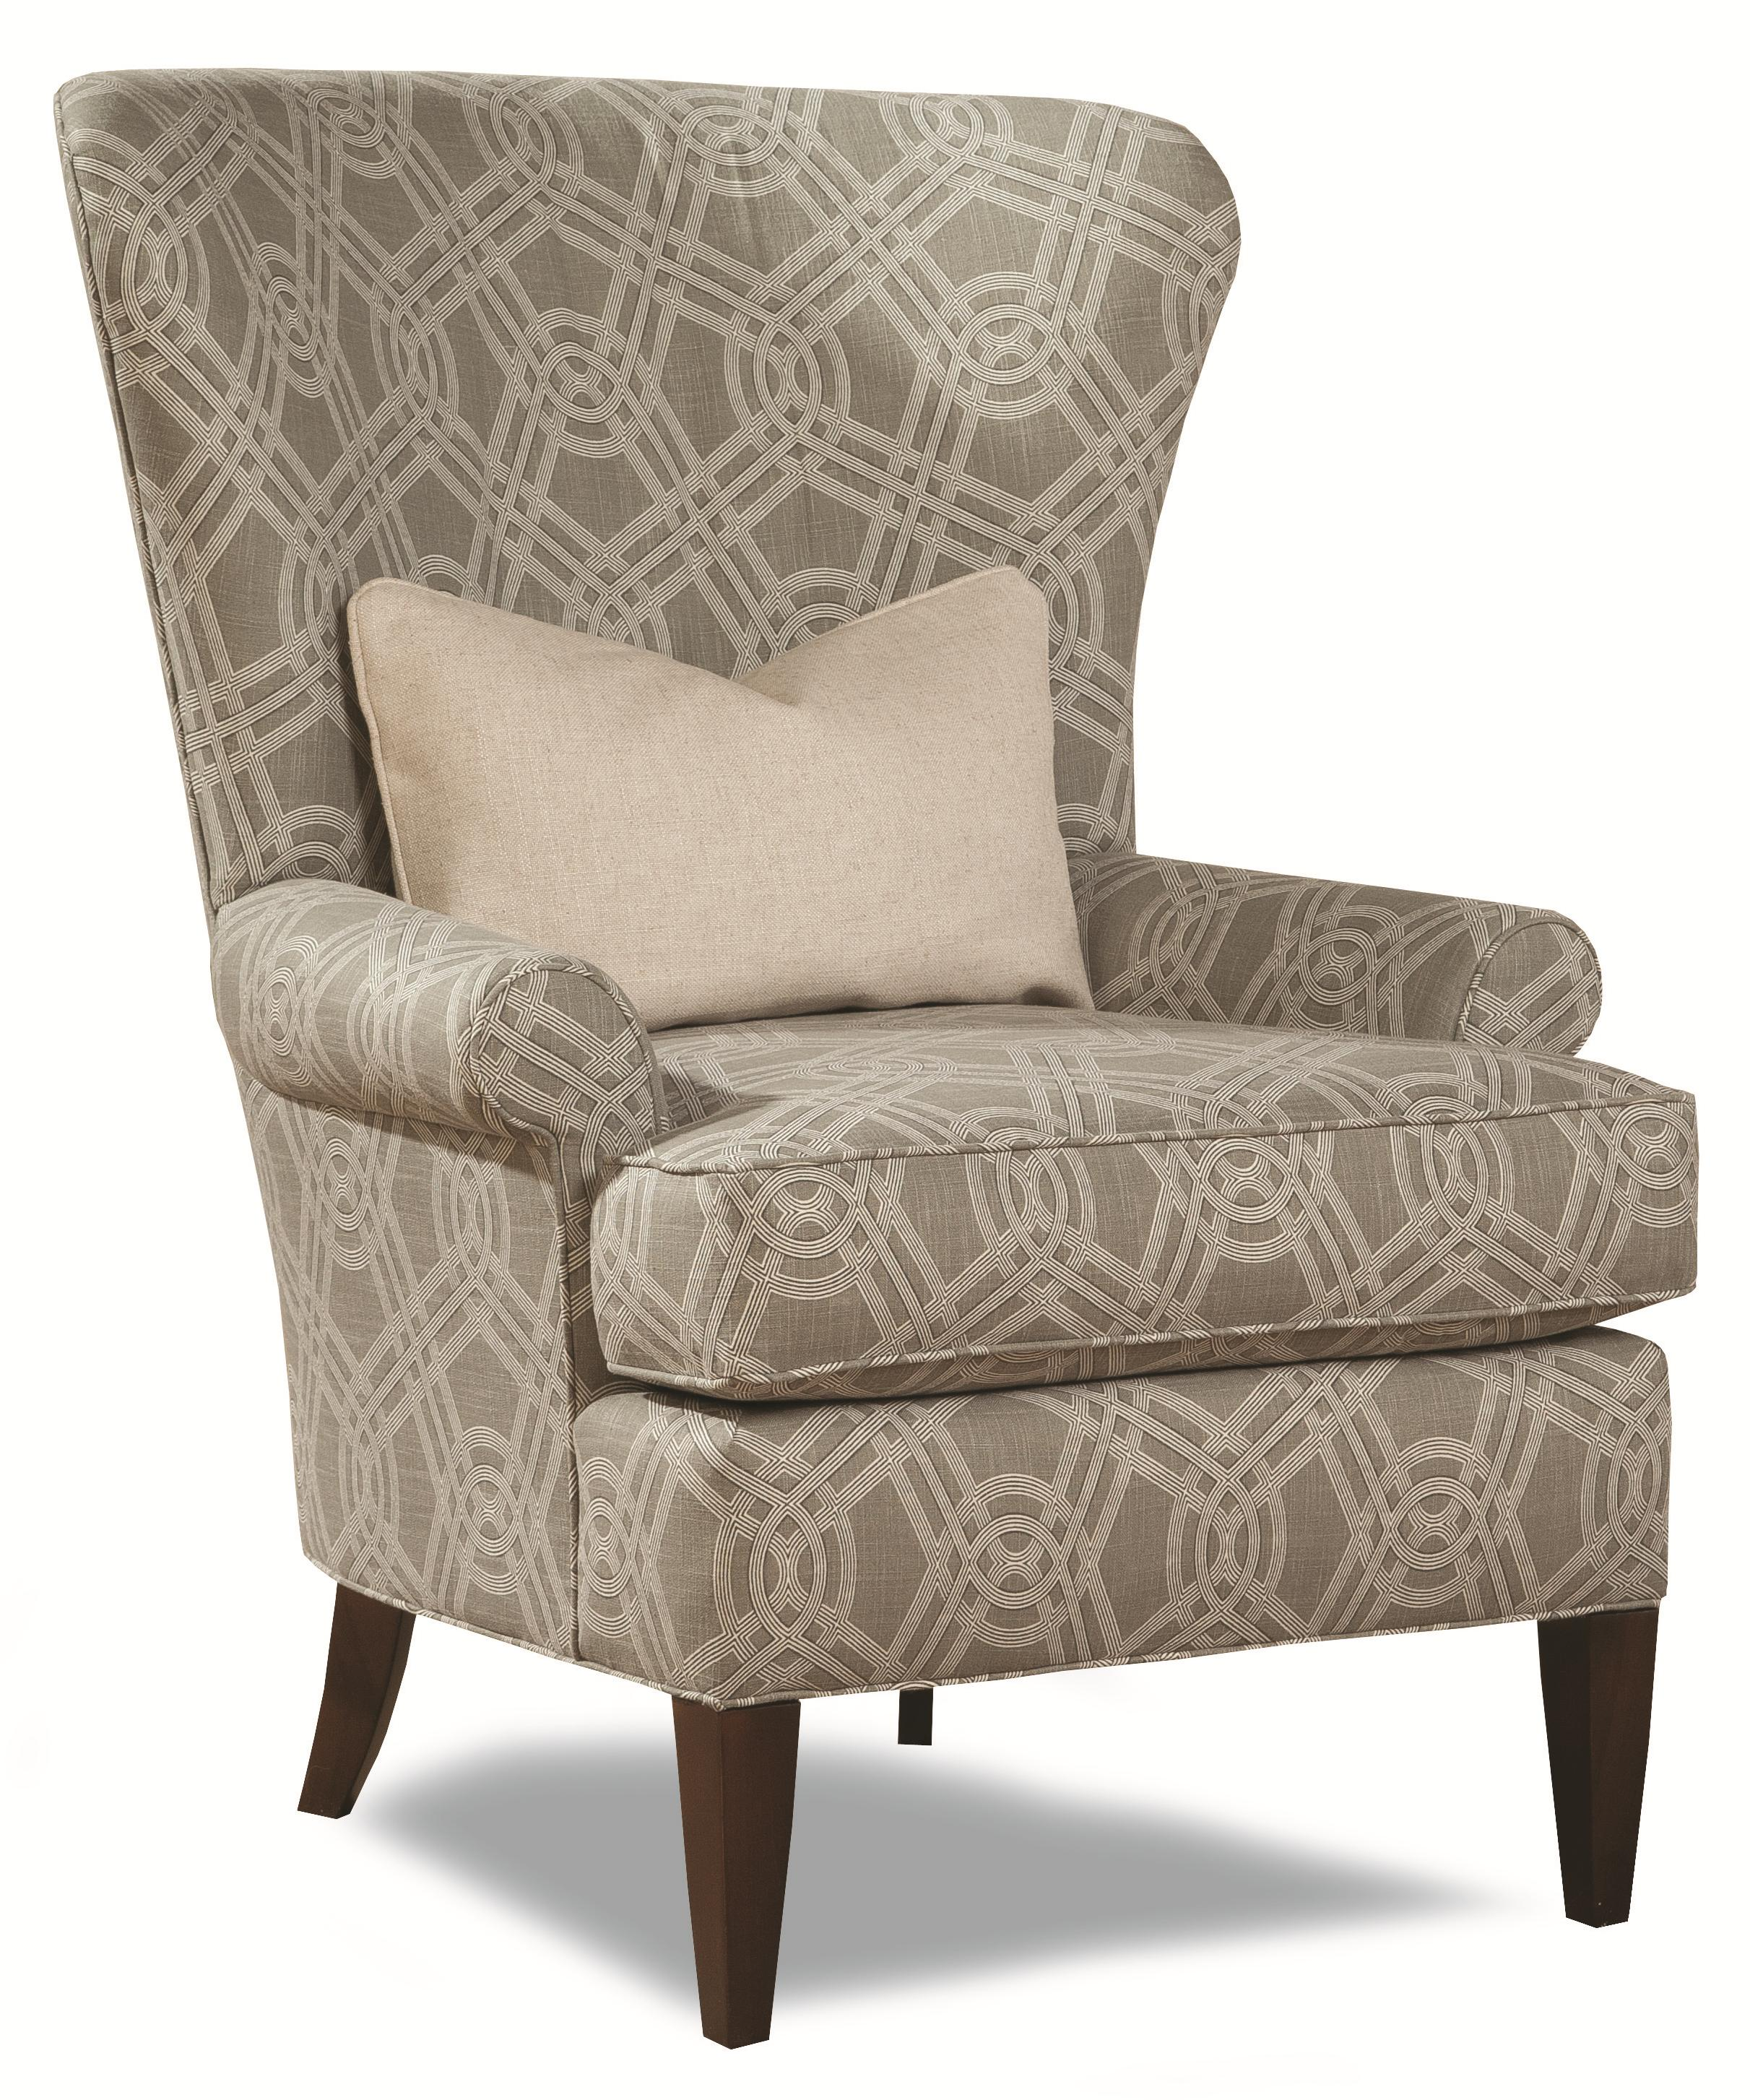 7491 Traditional Accent Chair by Geoffrey Alexander at Sprintz Furniture